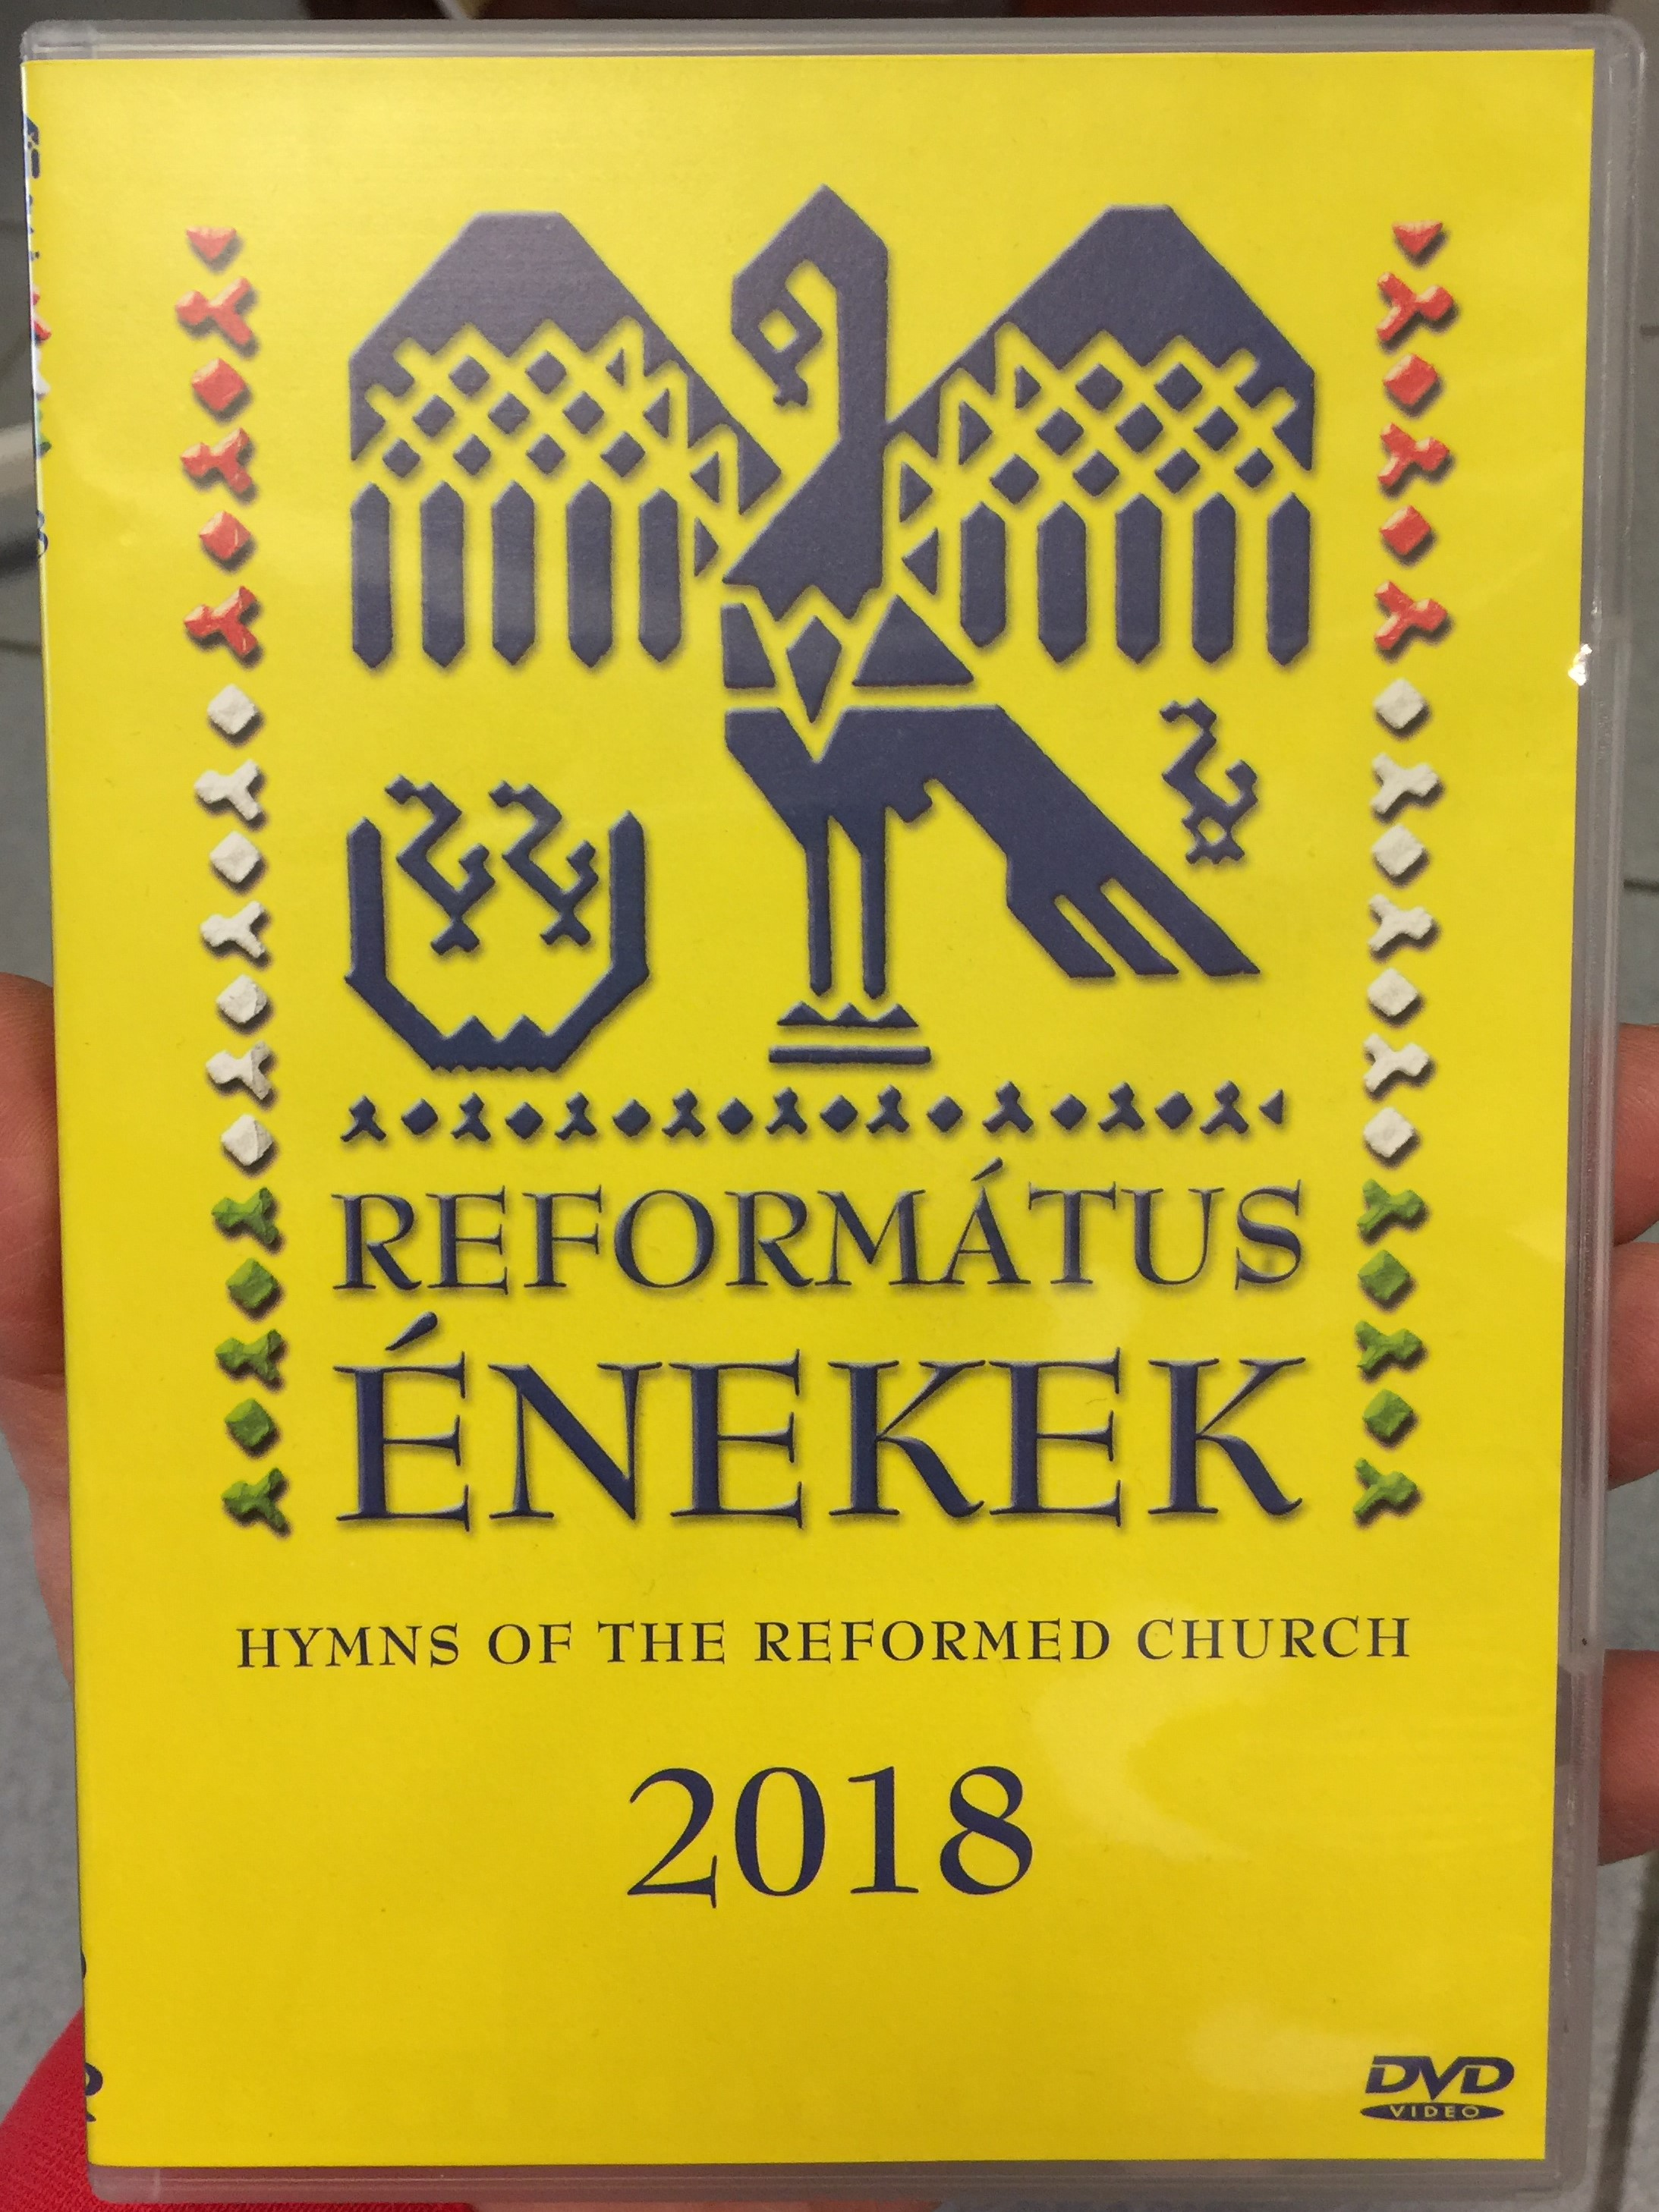 reform-tus-nekek-dvd-2018-hymns-of-the-reformed-church-2018-1.jpg